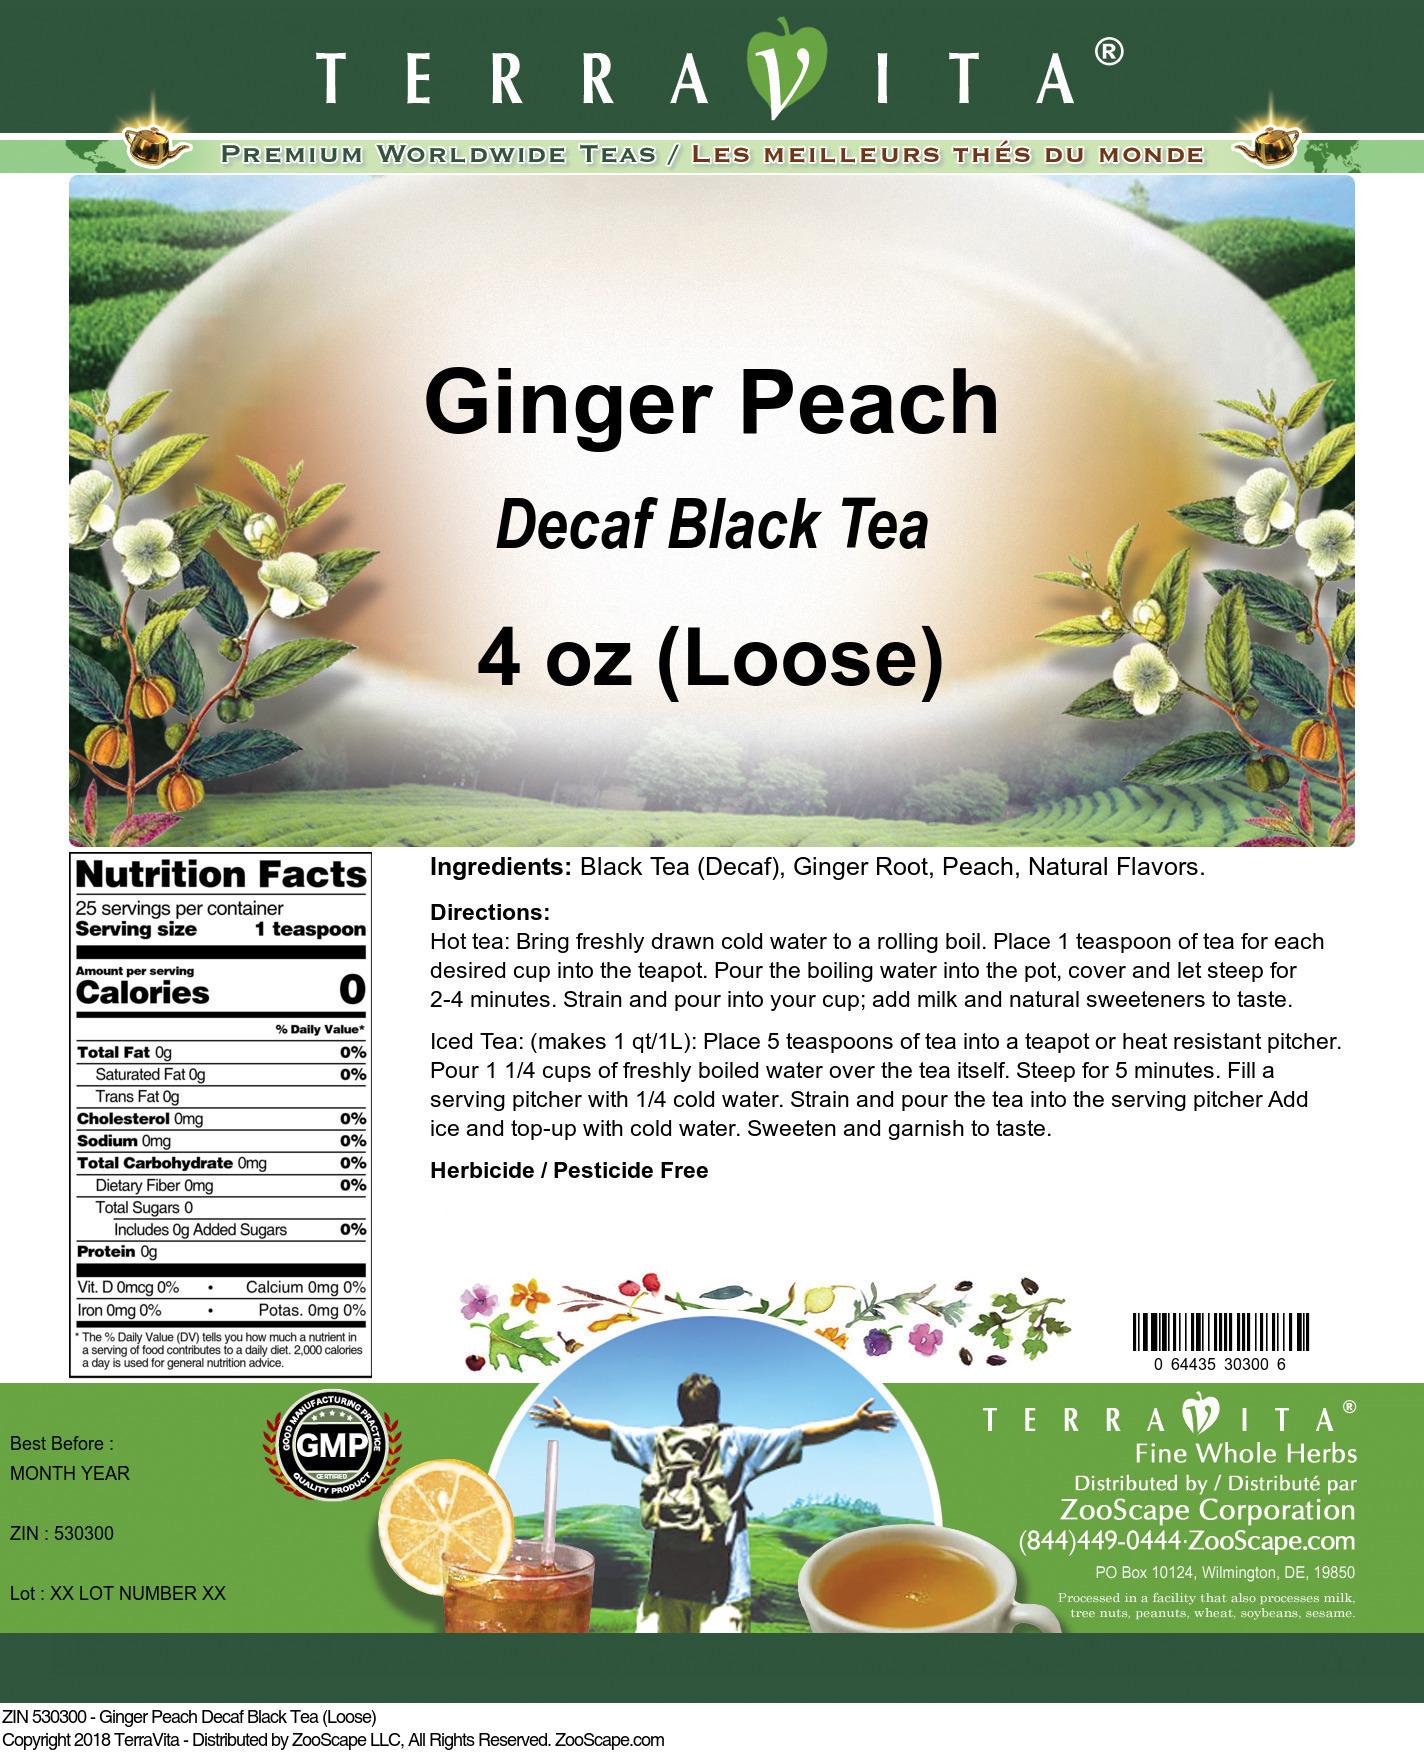 Ginger Peach Decaf Black Tea (Loose)